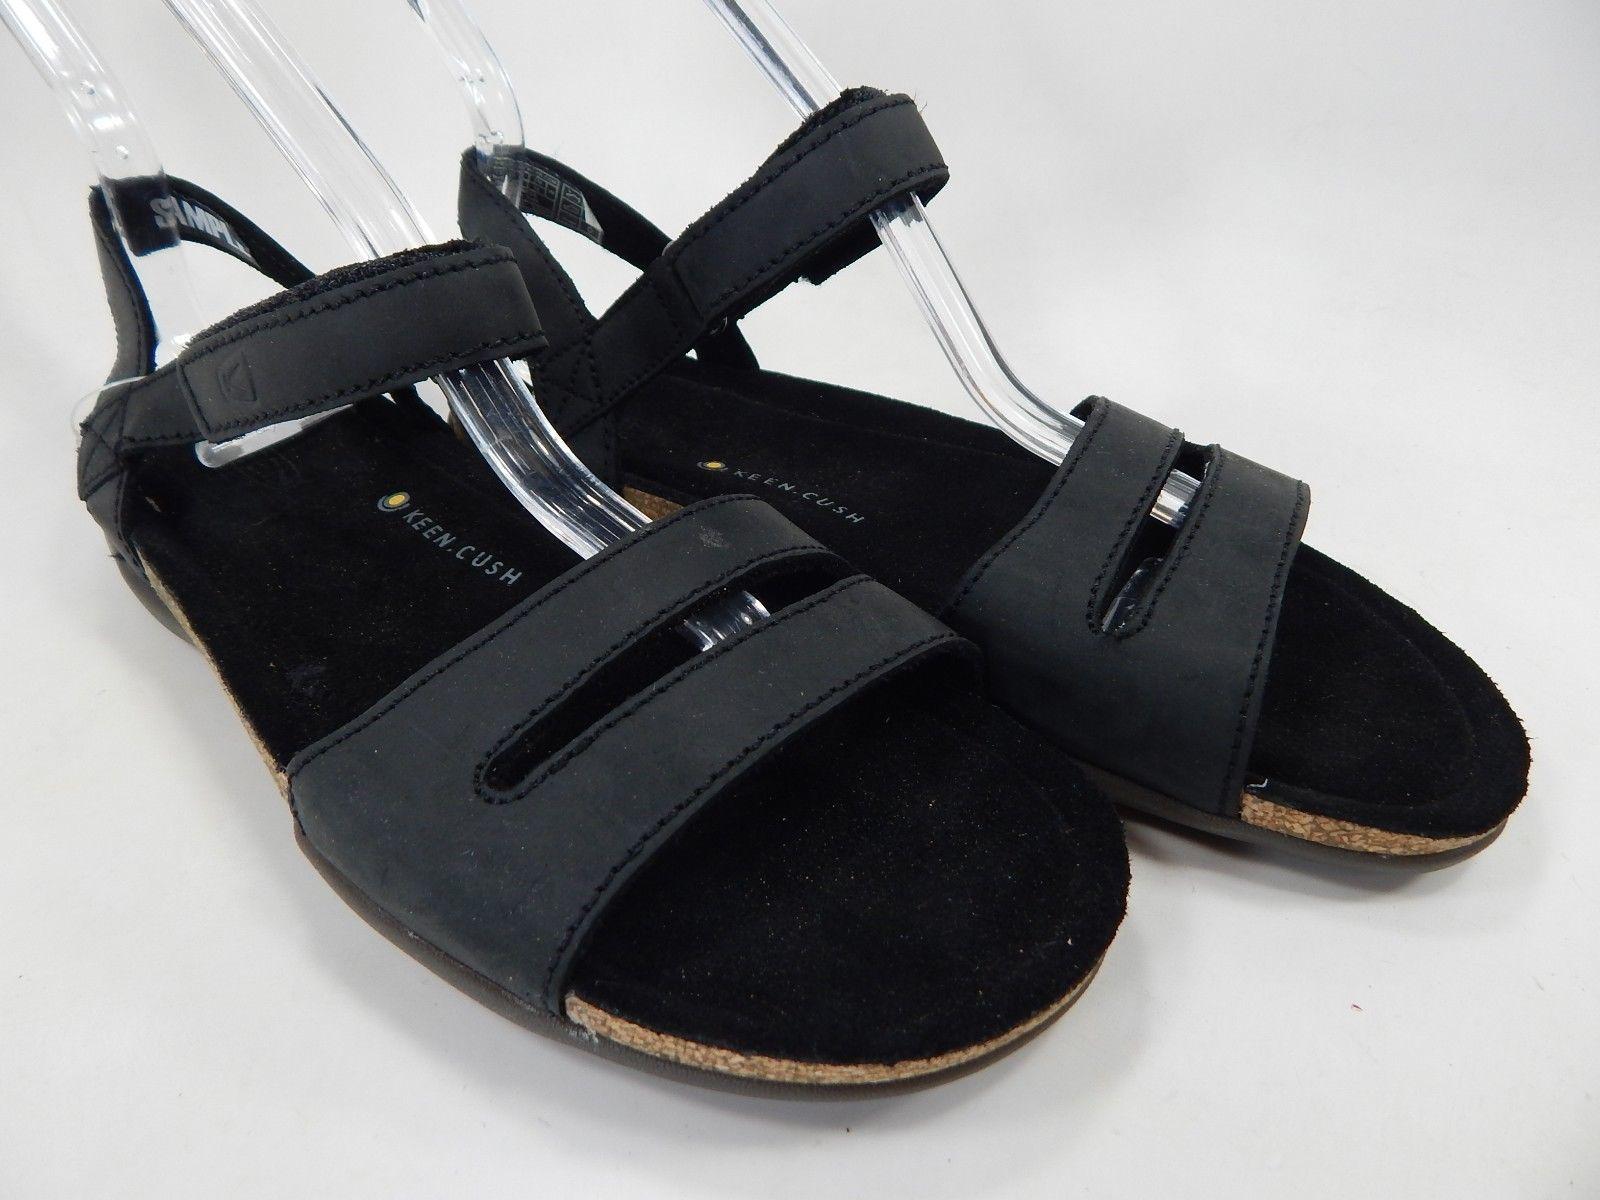 Keen Ana Cortez Size US 7 M EU 37.5 Women's Sports Sandals Black